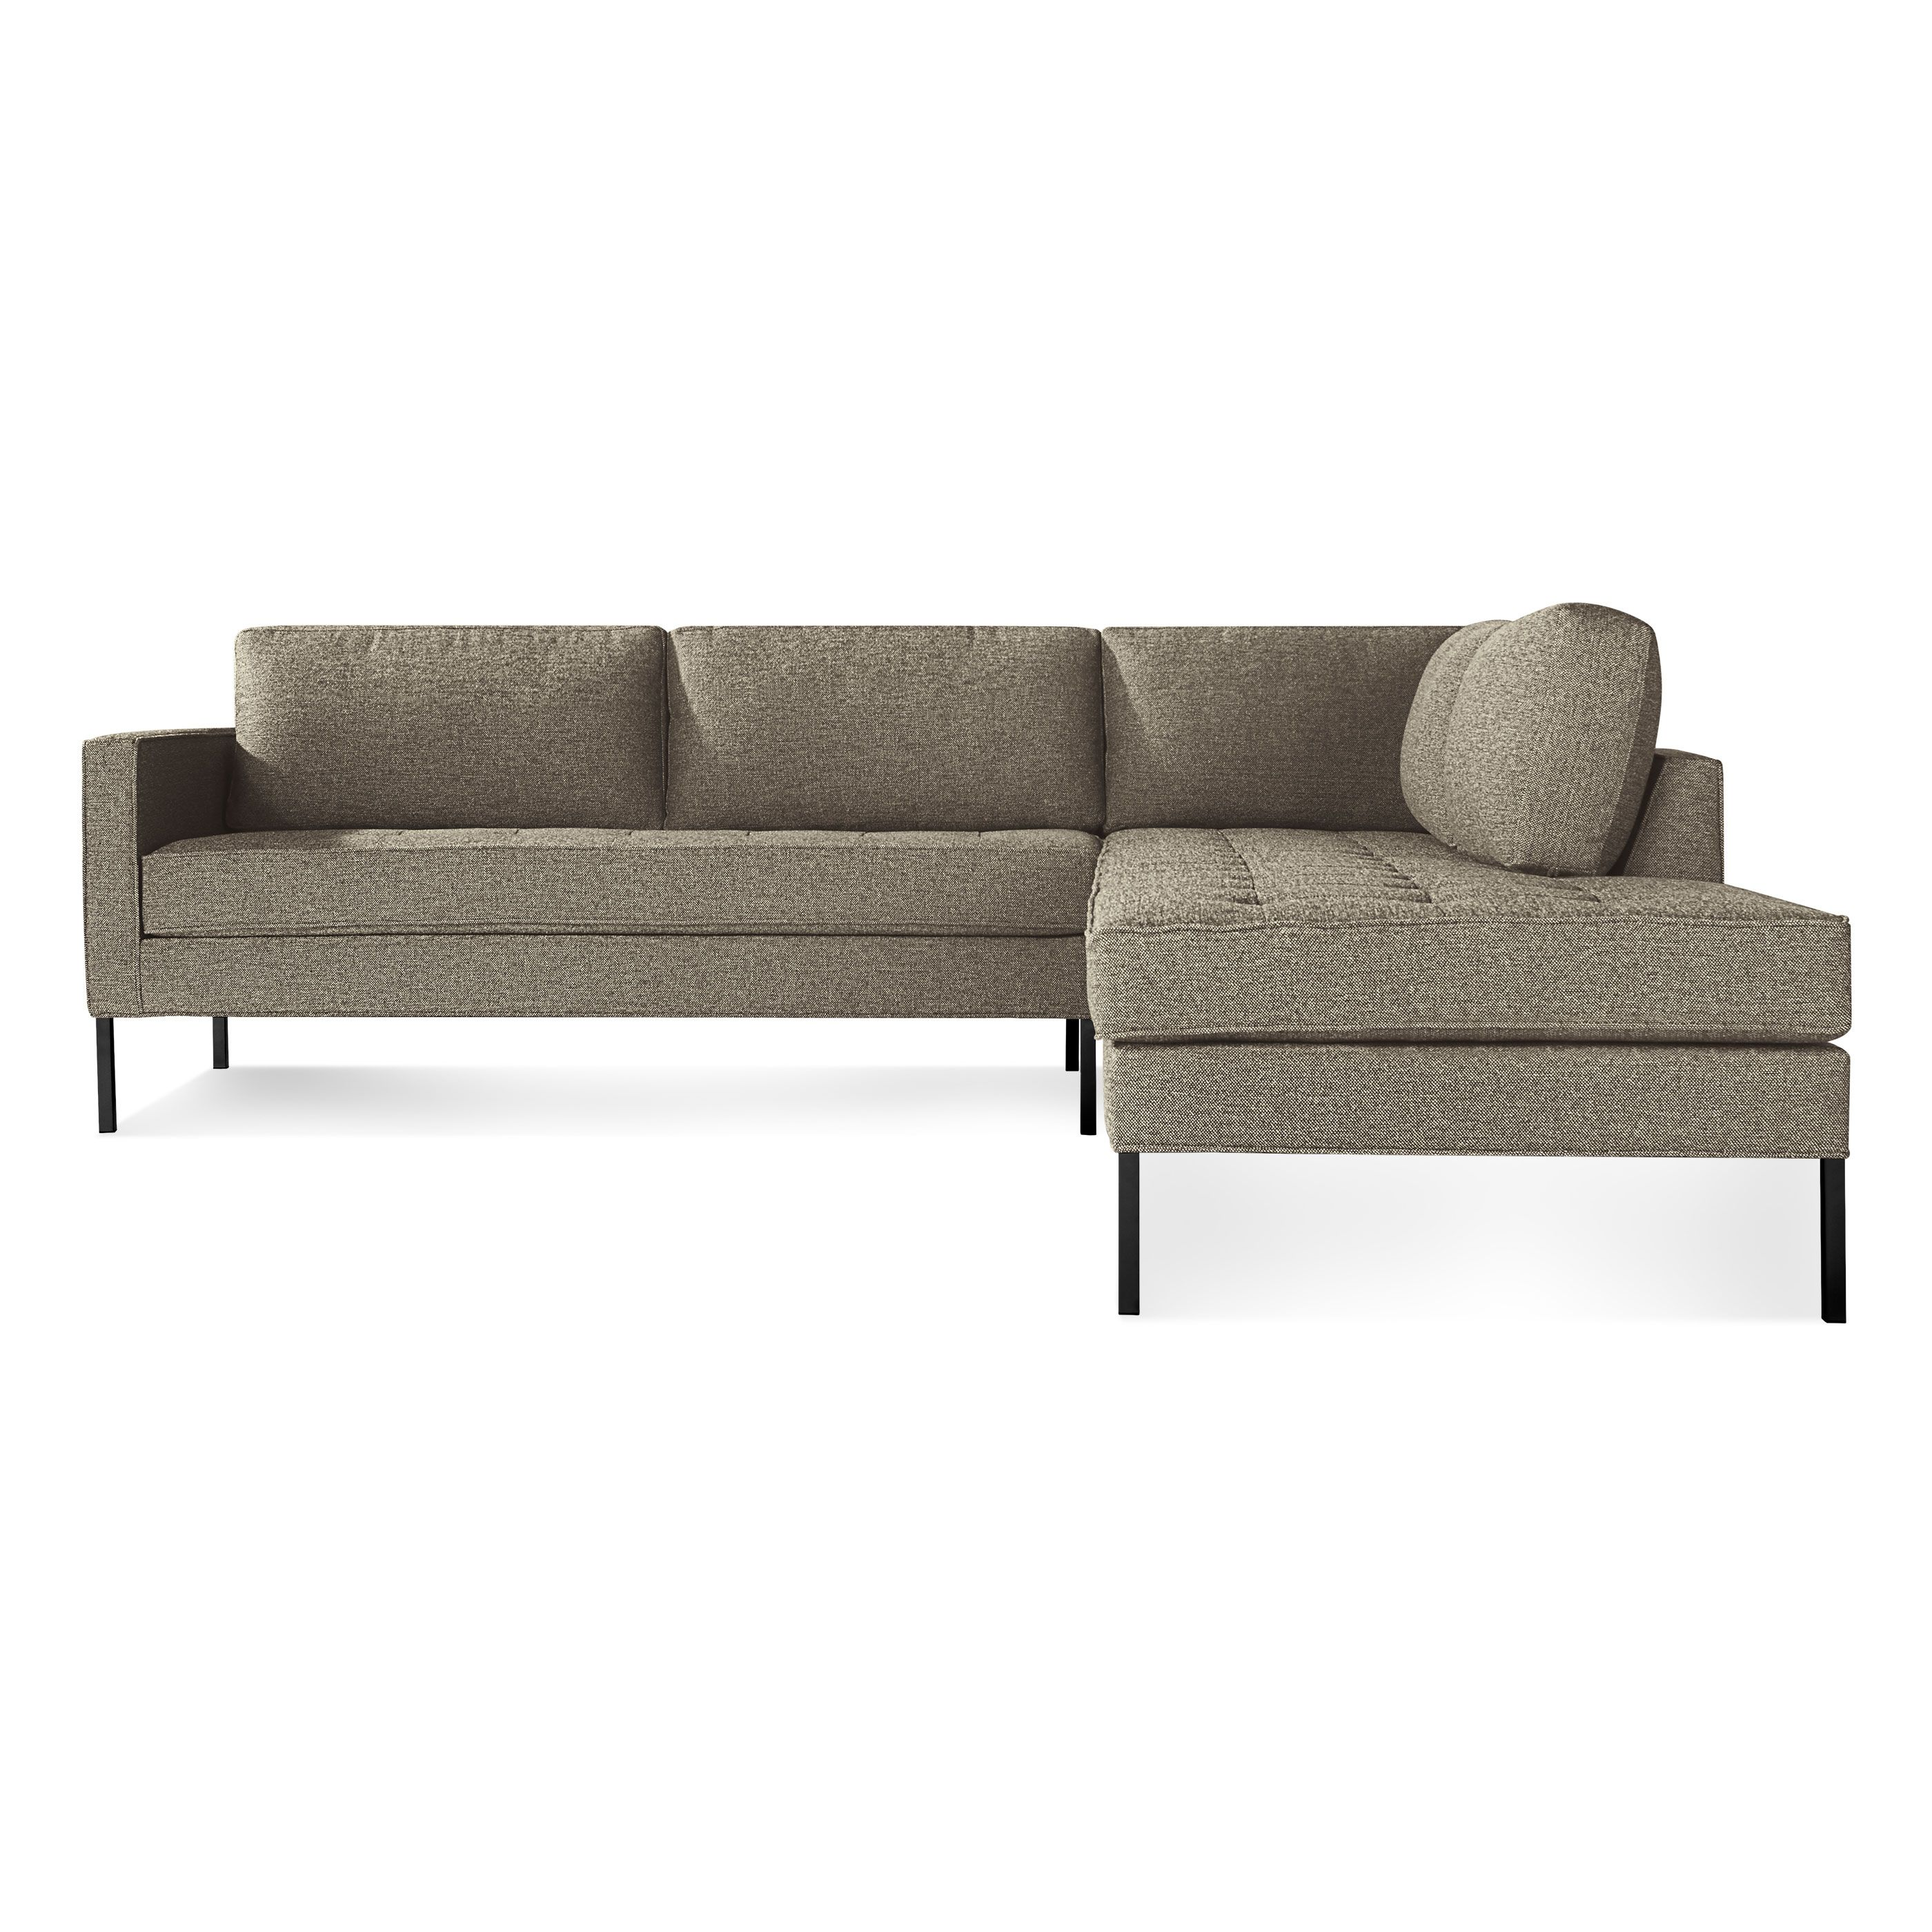 Roman Sofa Italian Furniture Stores Italian Furniture Modern Furniture